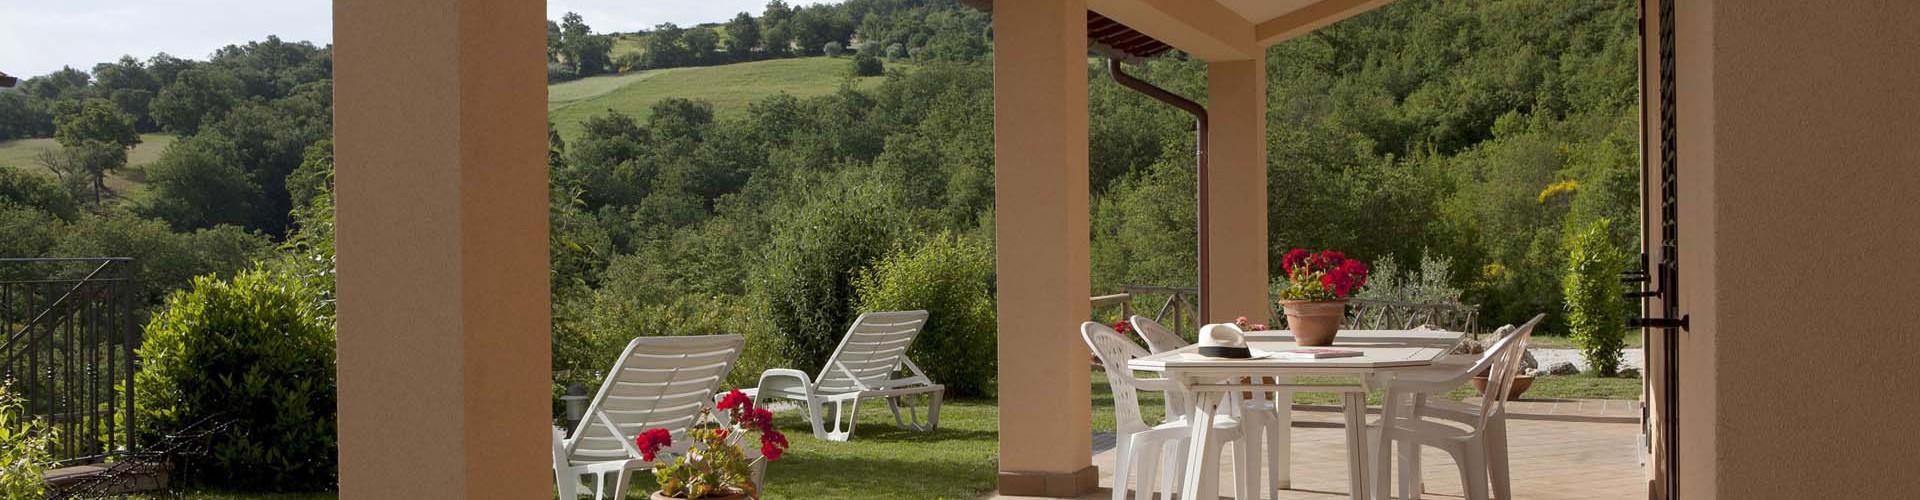 Relais Parco del Subasio | Agriturismo Assisi - Residenza Spello Featured Image